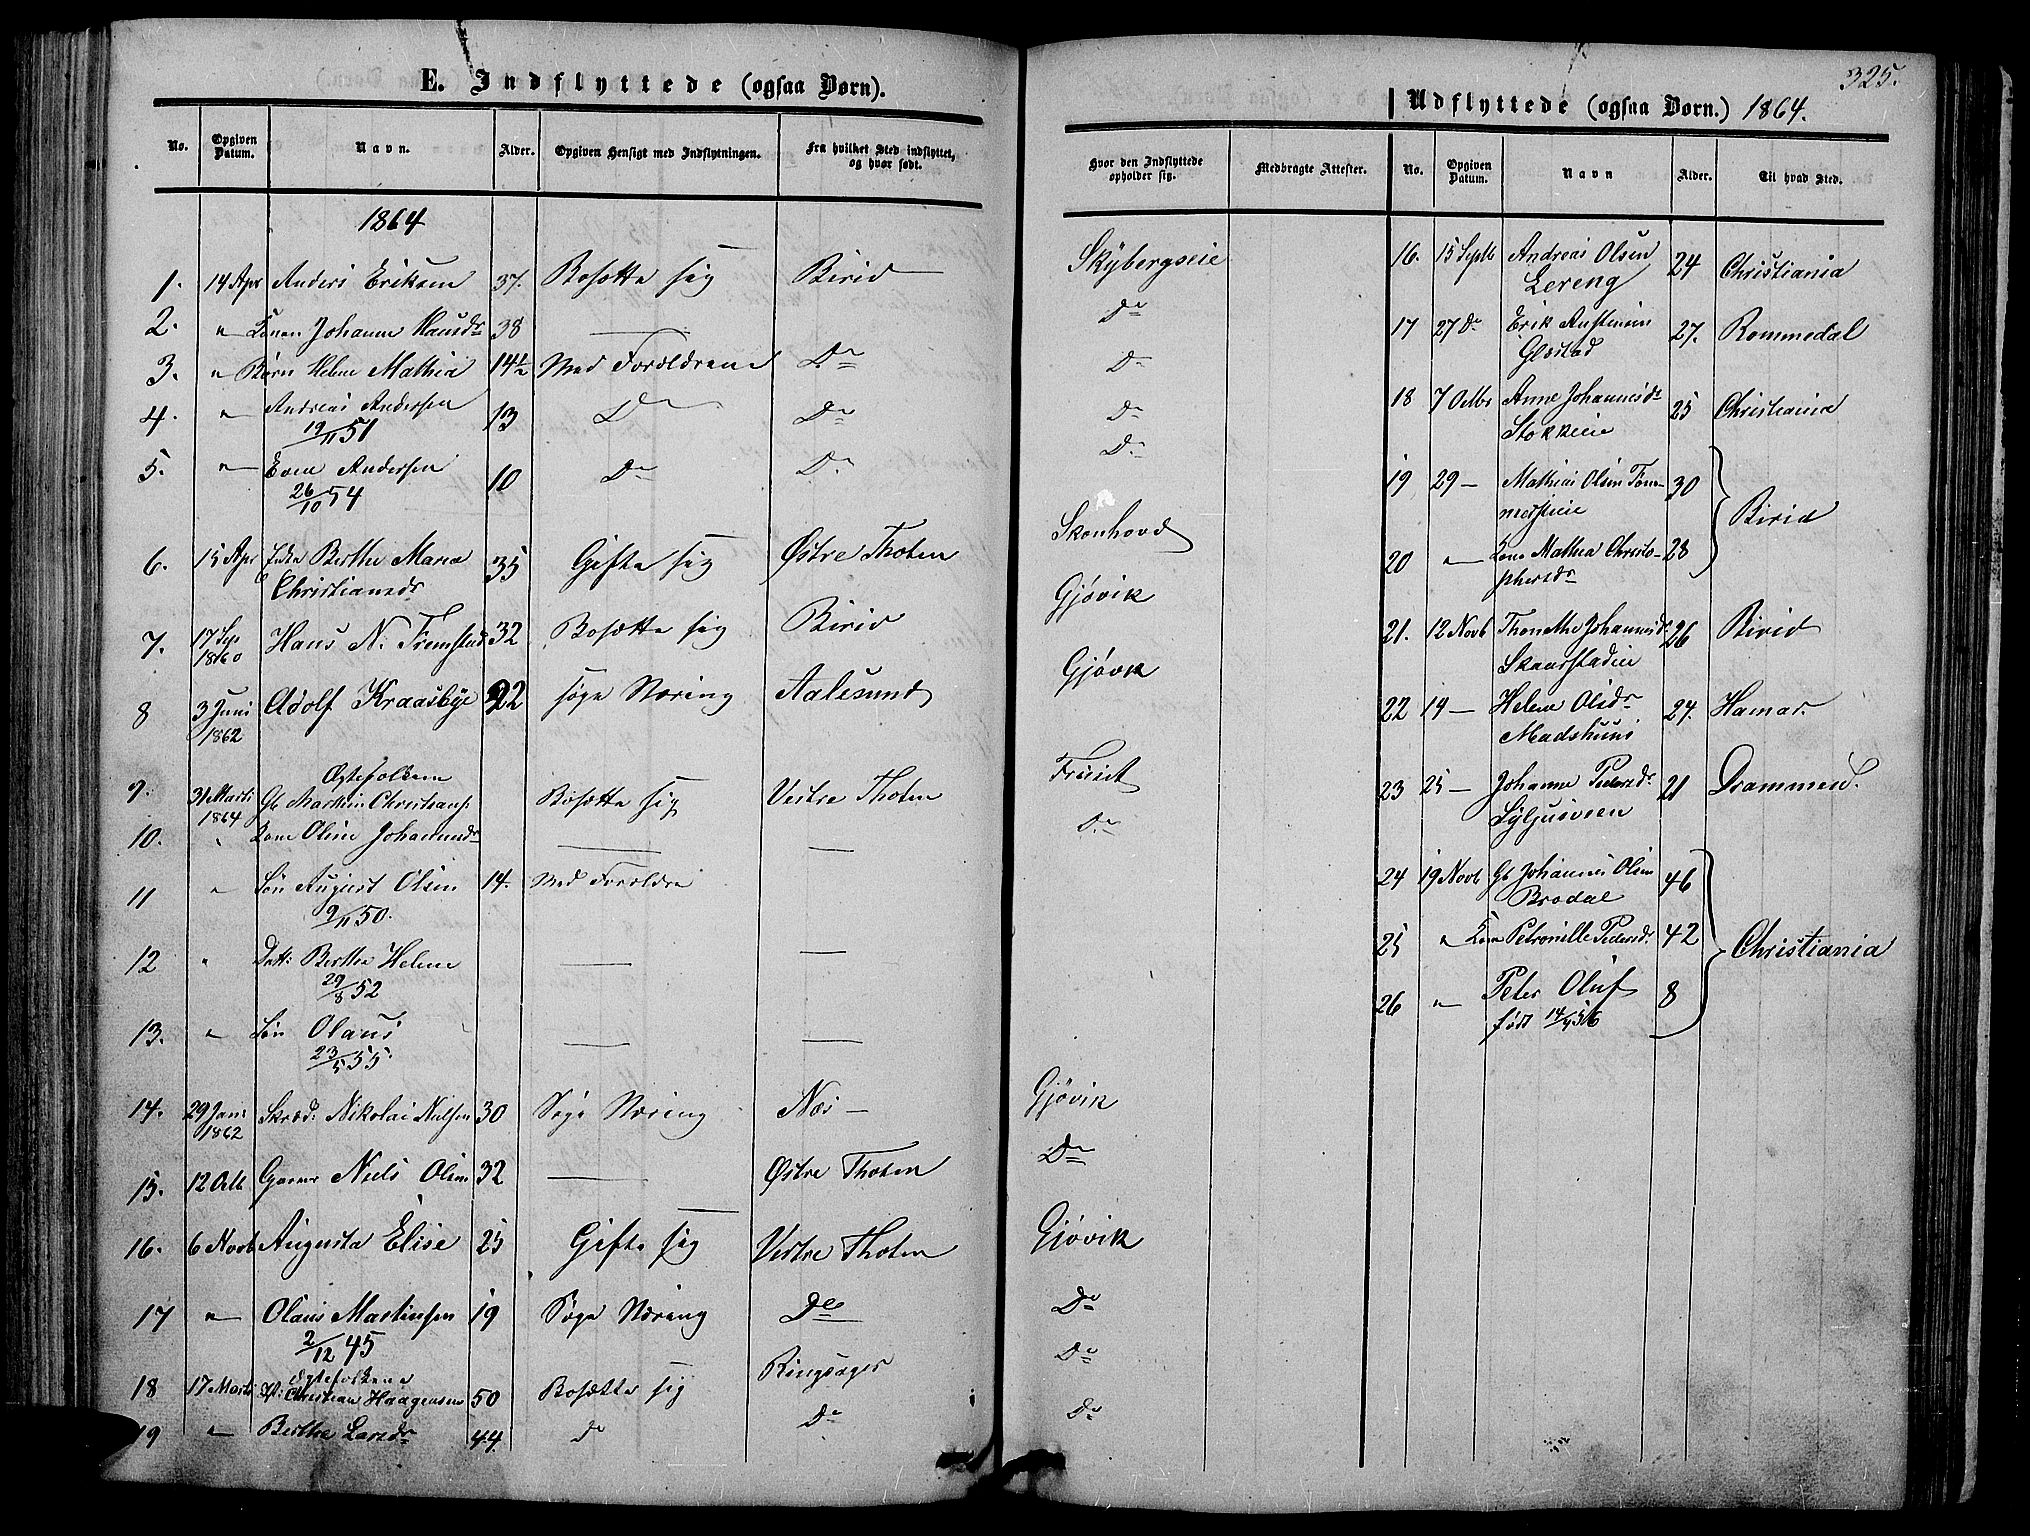 SAH, Vardal prestekontor, H/Ha/Hab/L0005: Klokkerbok nr. 5, 1854-1868, s. 325